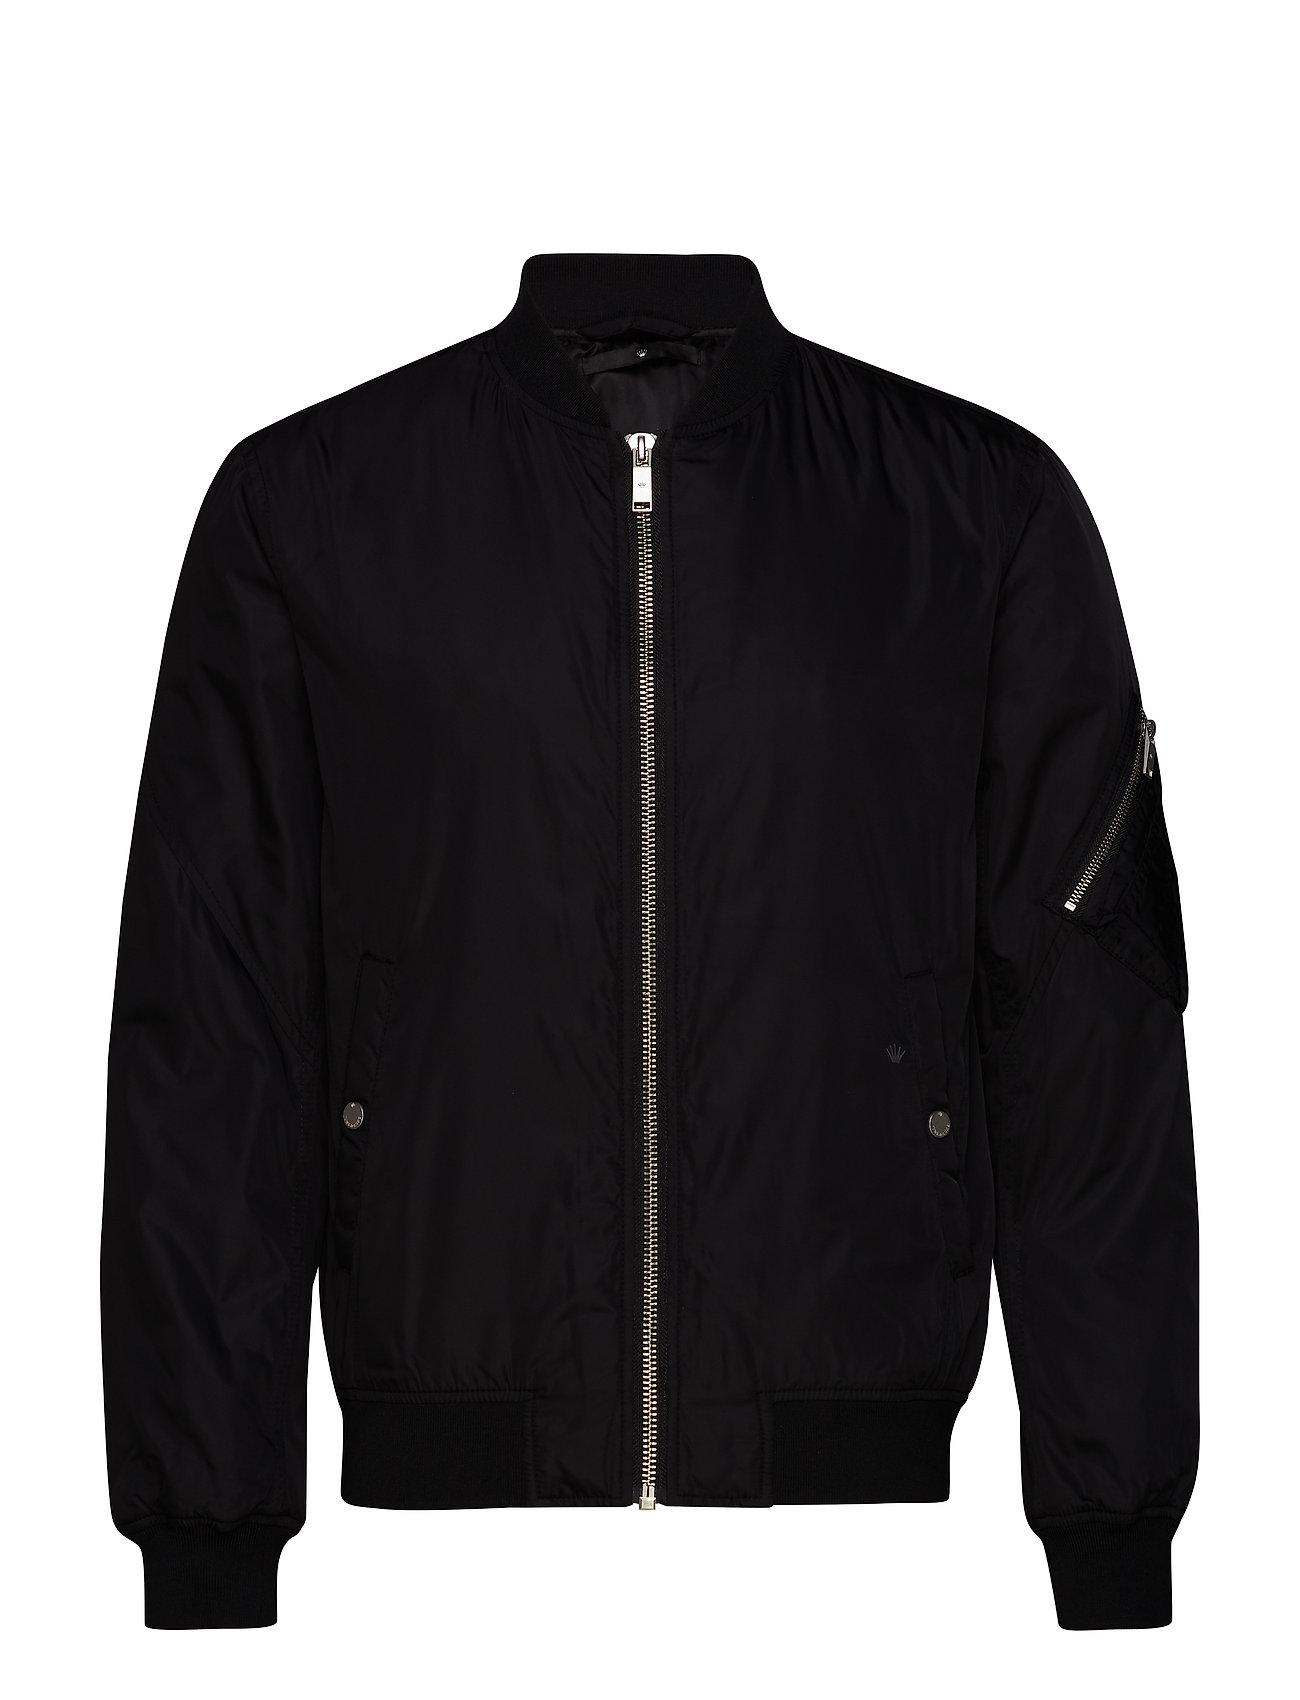 JUNK de LUXE Padded bomber jacket - BLACK